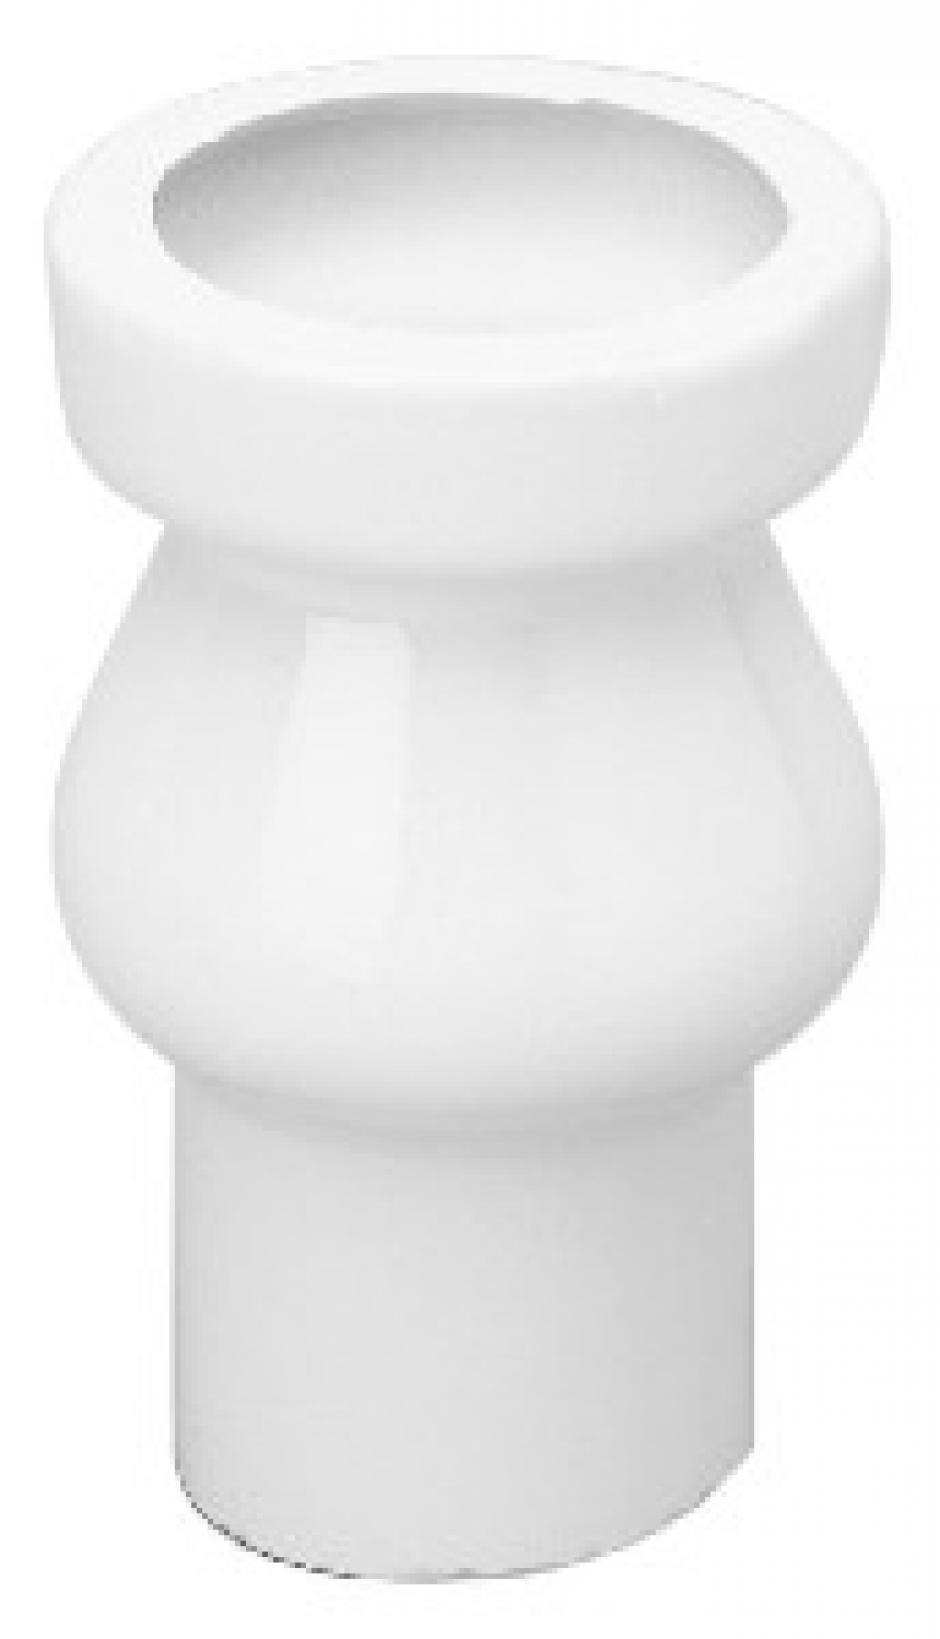 salle de bain cuvette wc tubulure porcelaine aspirambo courte. Black Bedroom Furniture Sets. Home Design Ideas